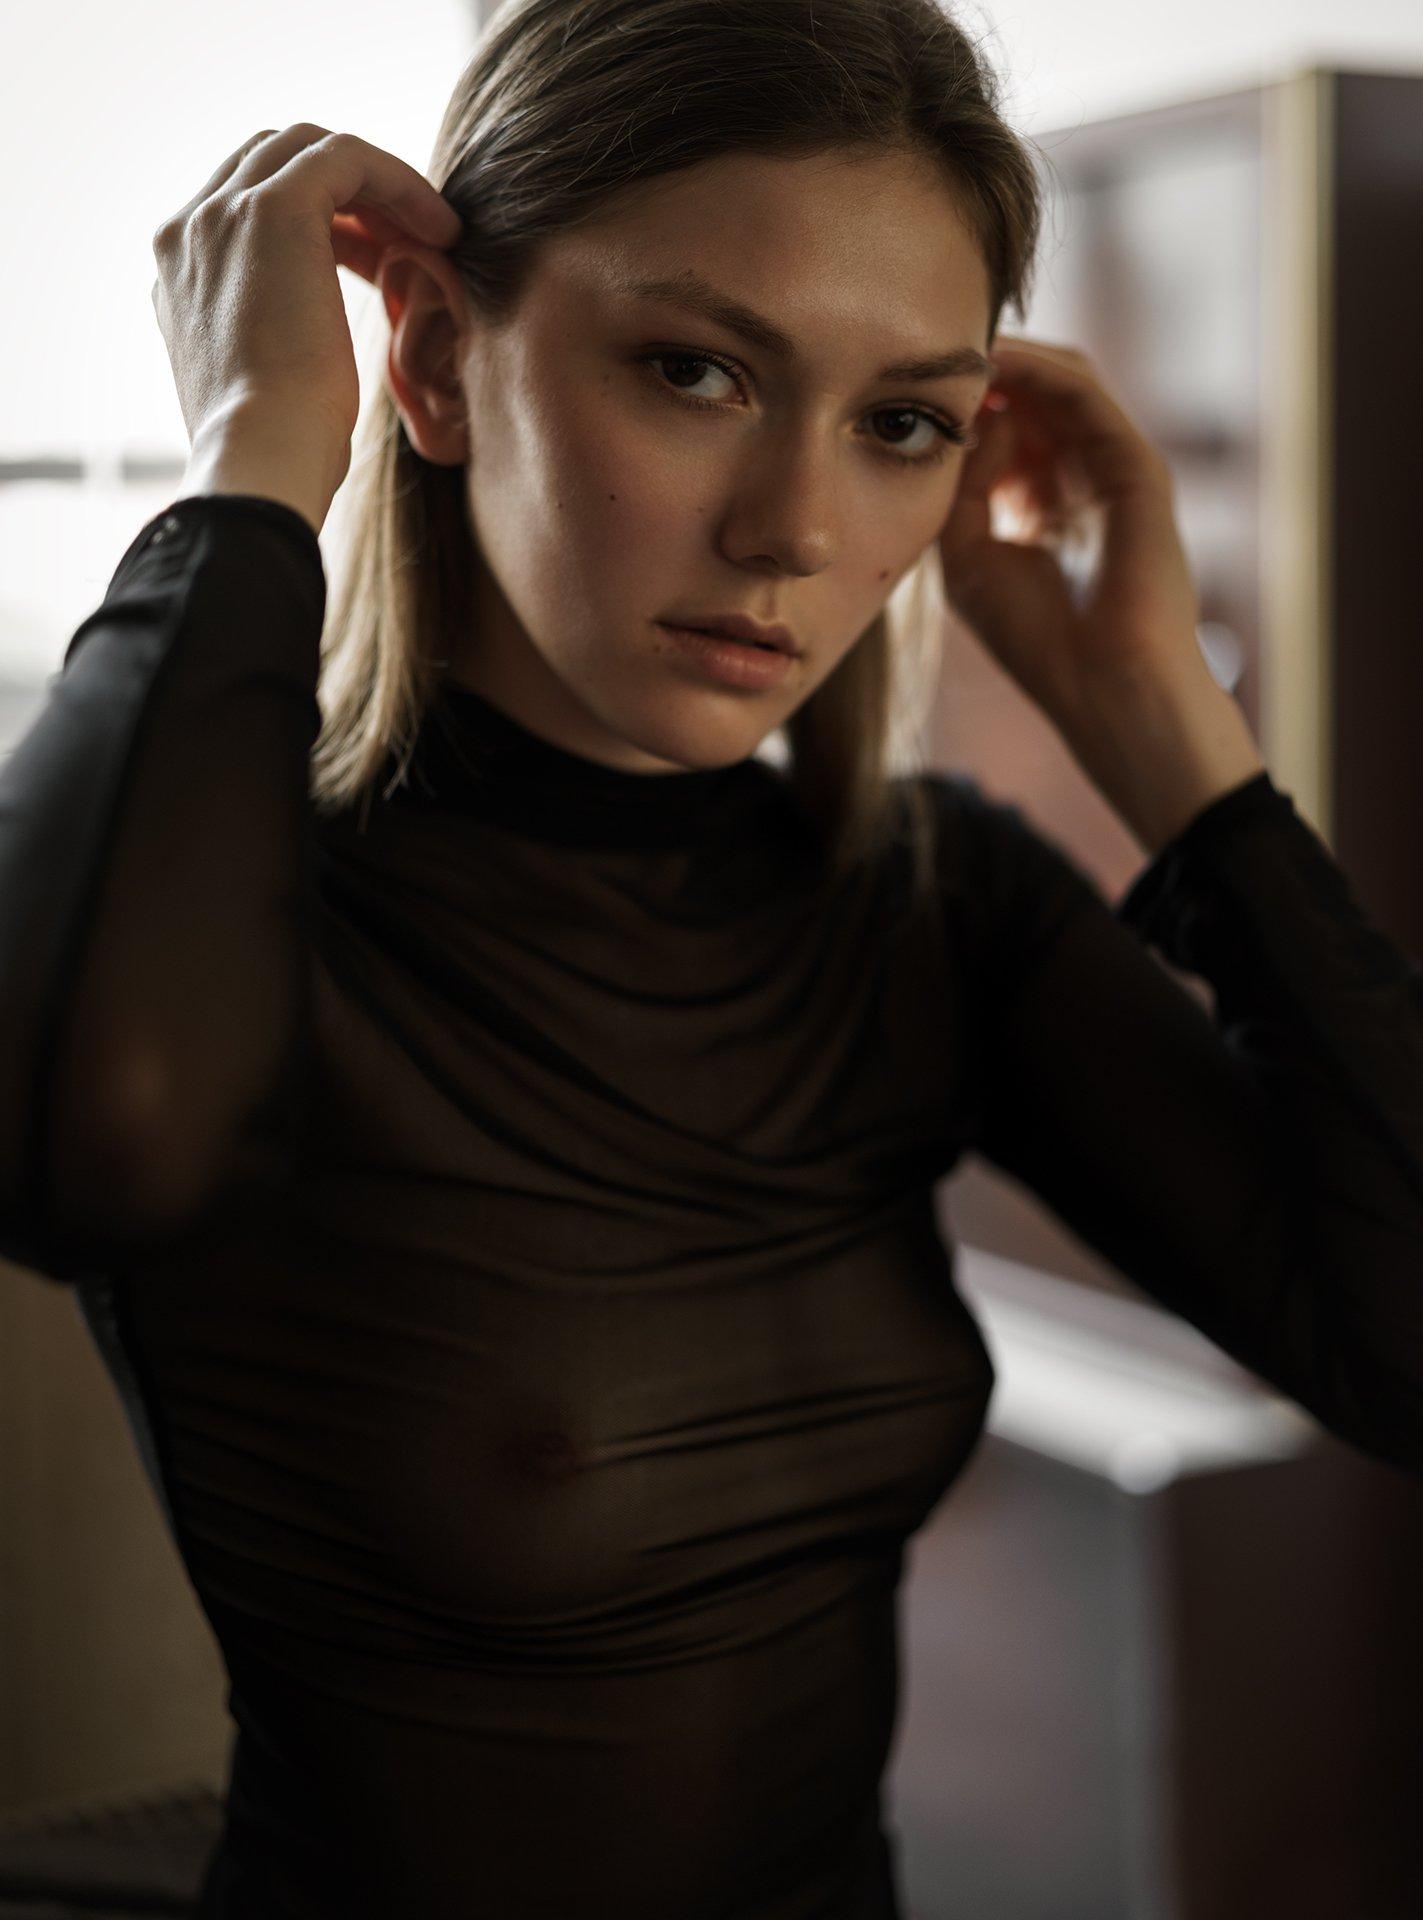 girl, коверильича, portrait, at home, nude, natural light, sonyphotography, model, Роман Филиппов